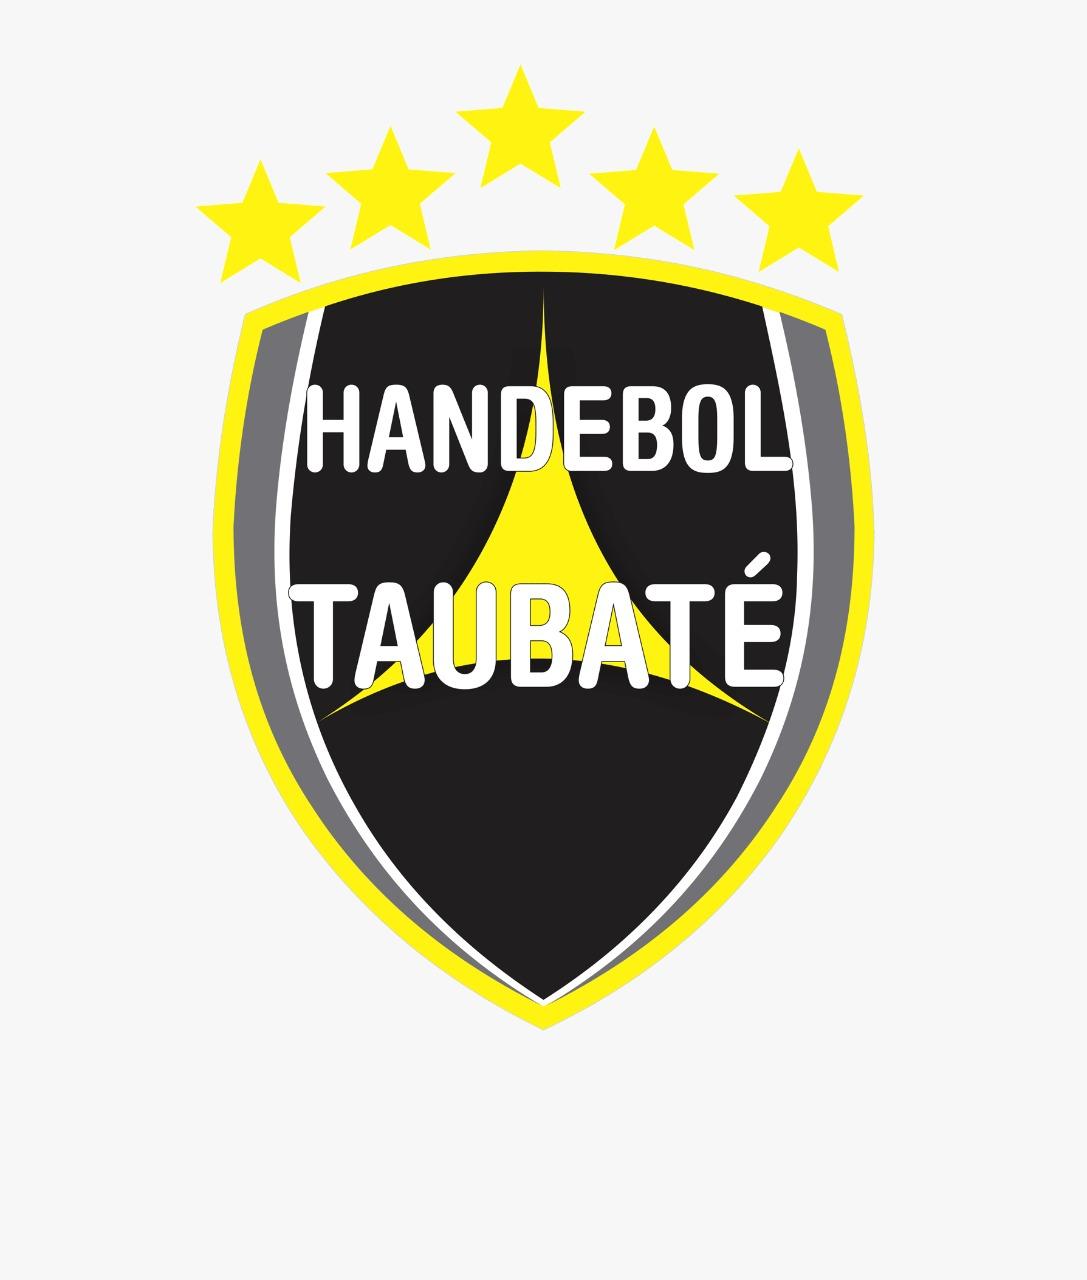 Handebol Taubaté